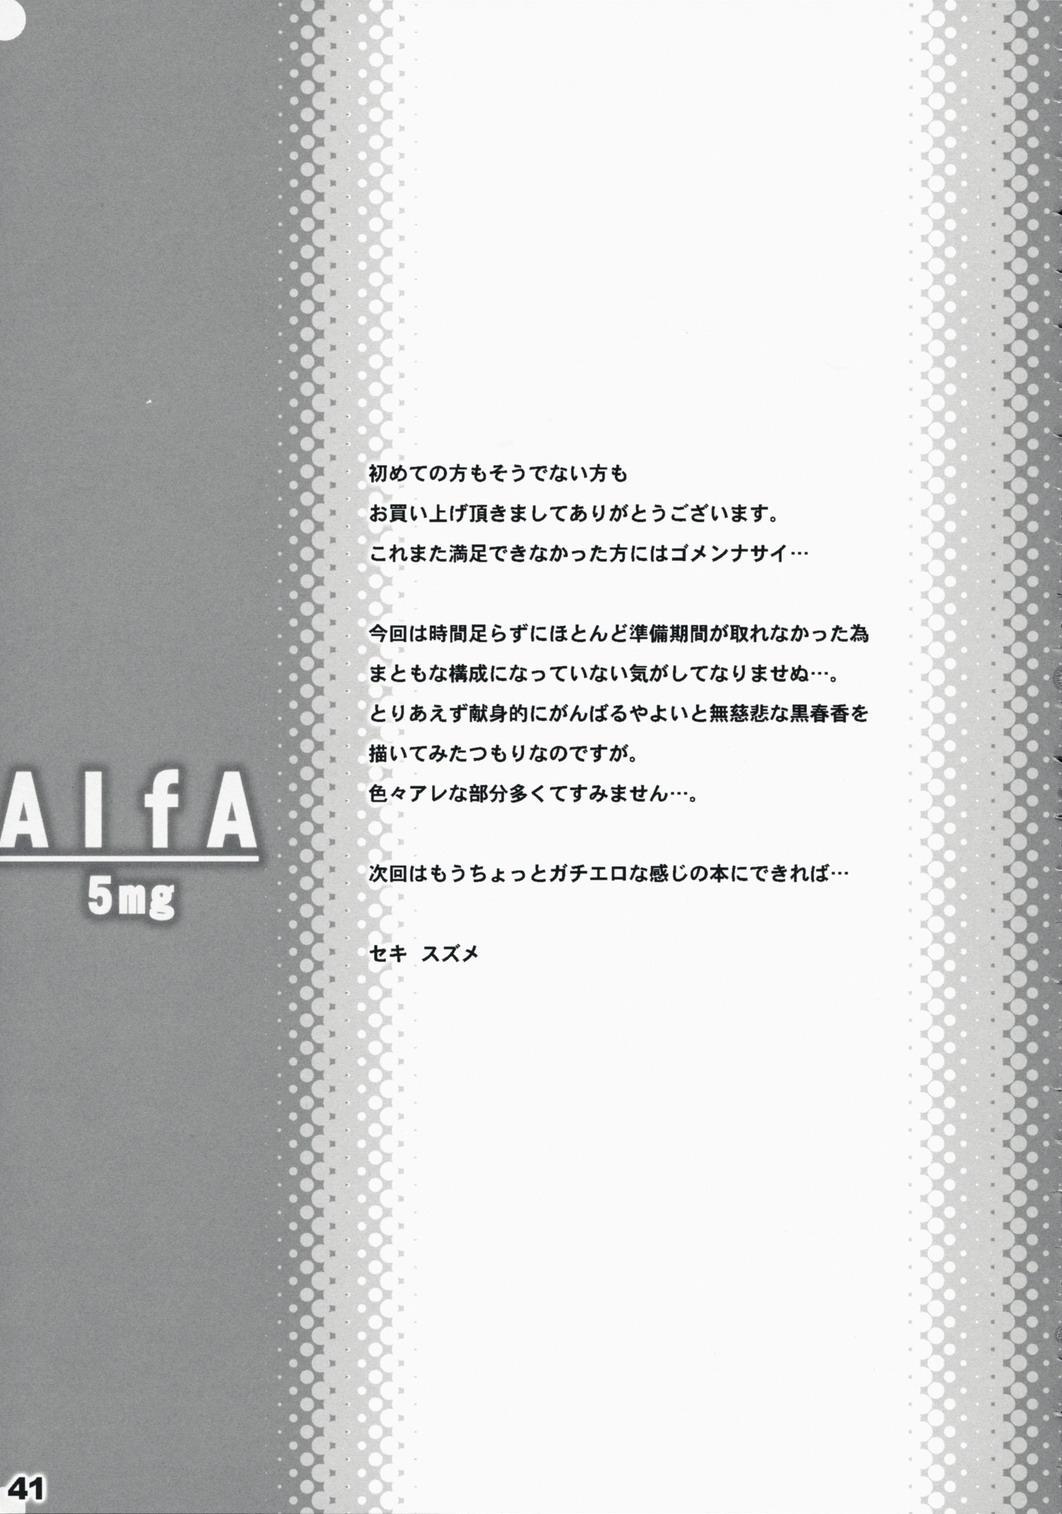 AlfA 5mg 39